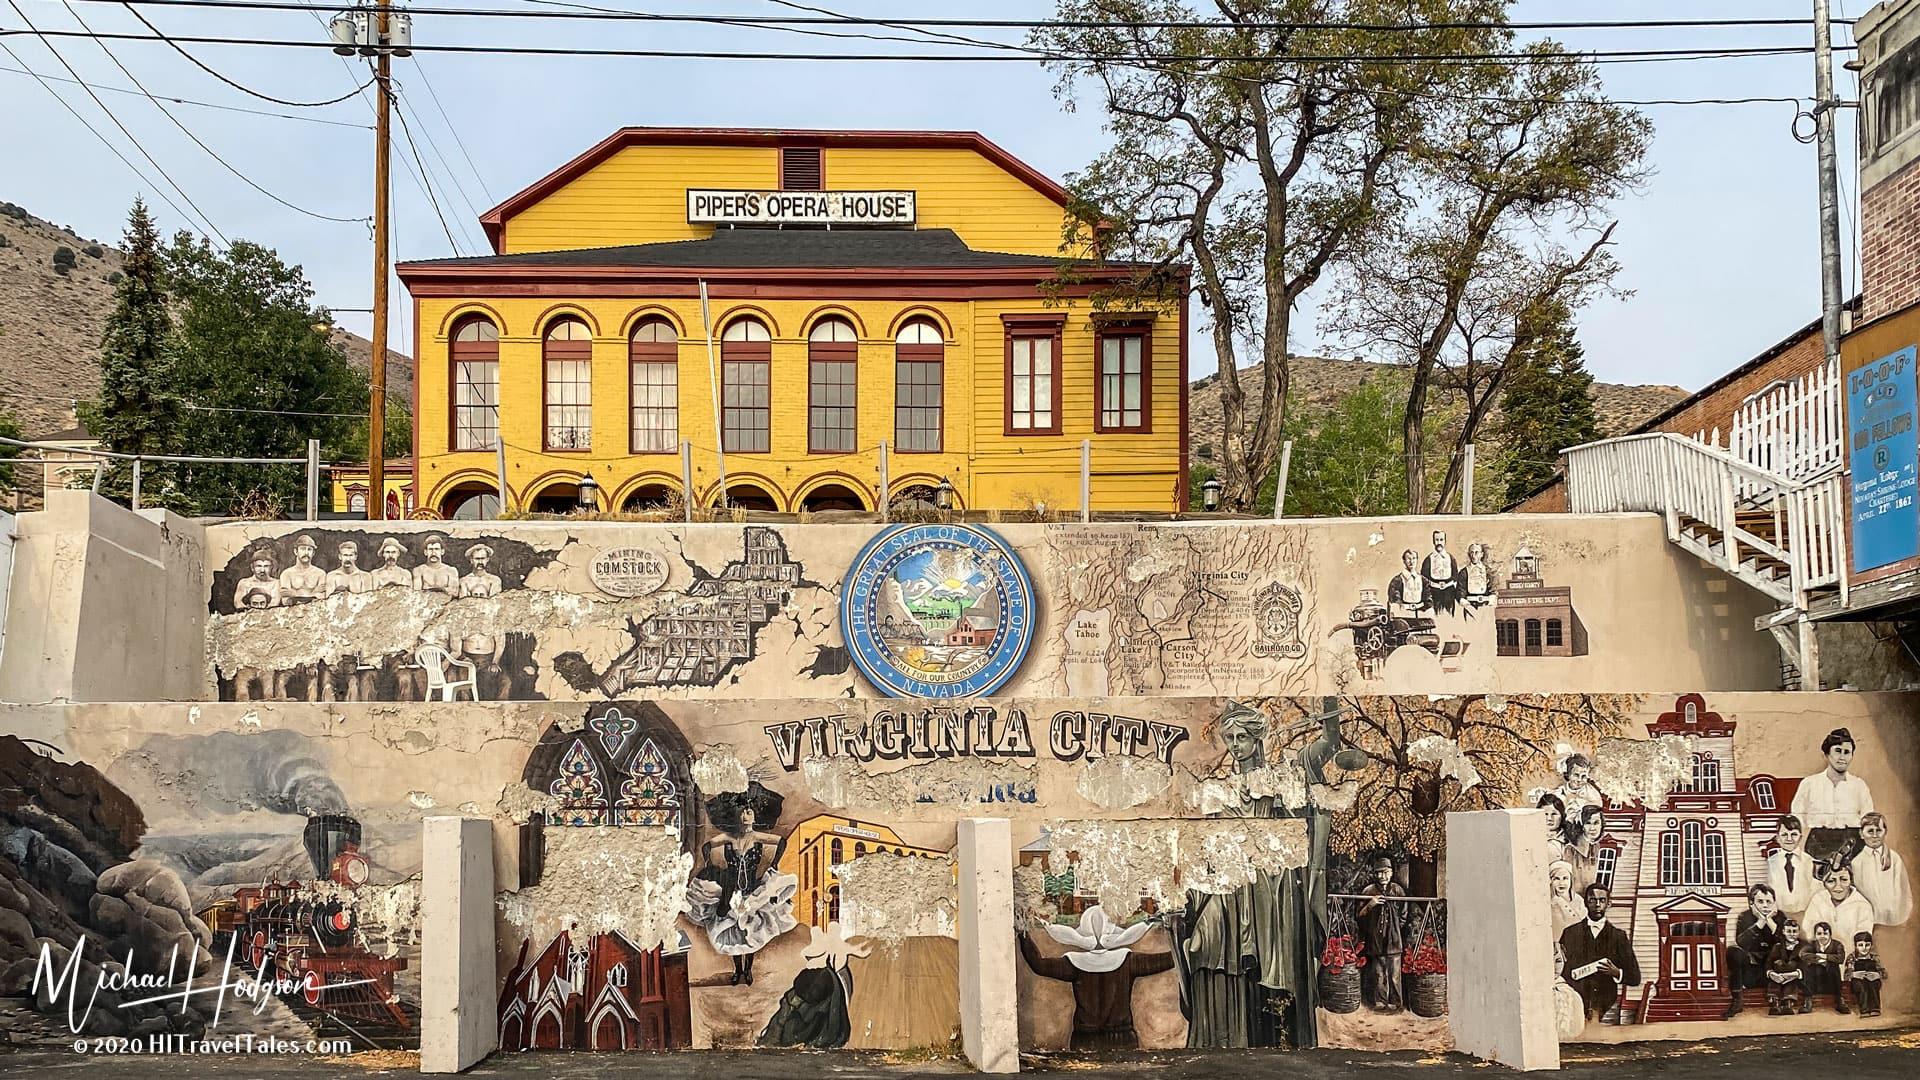 Virginia City Mural Below Pipers Opera House